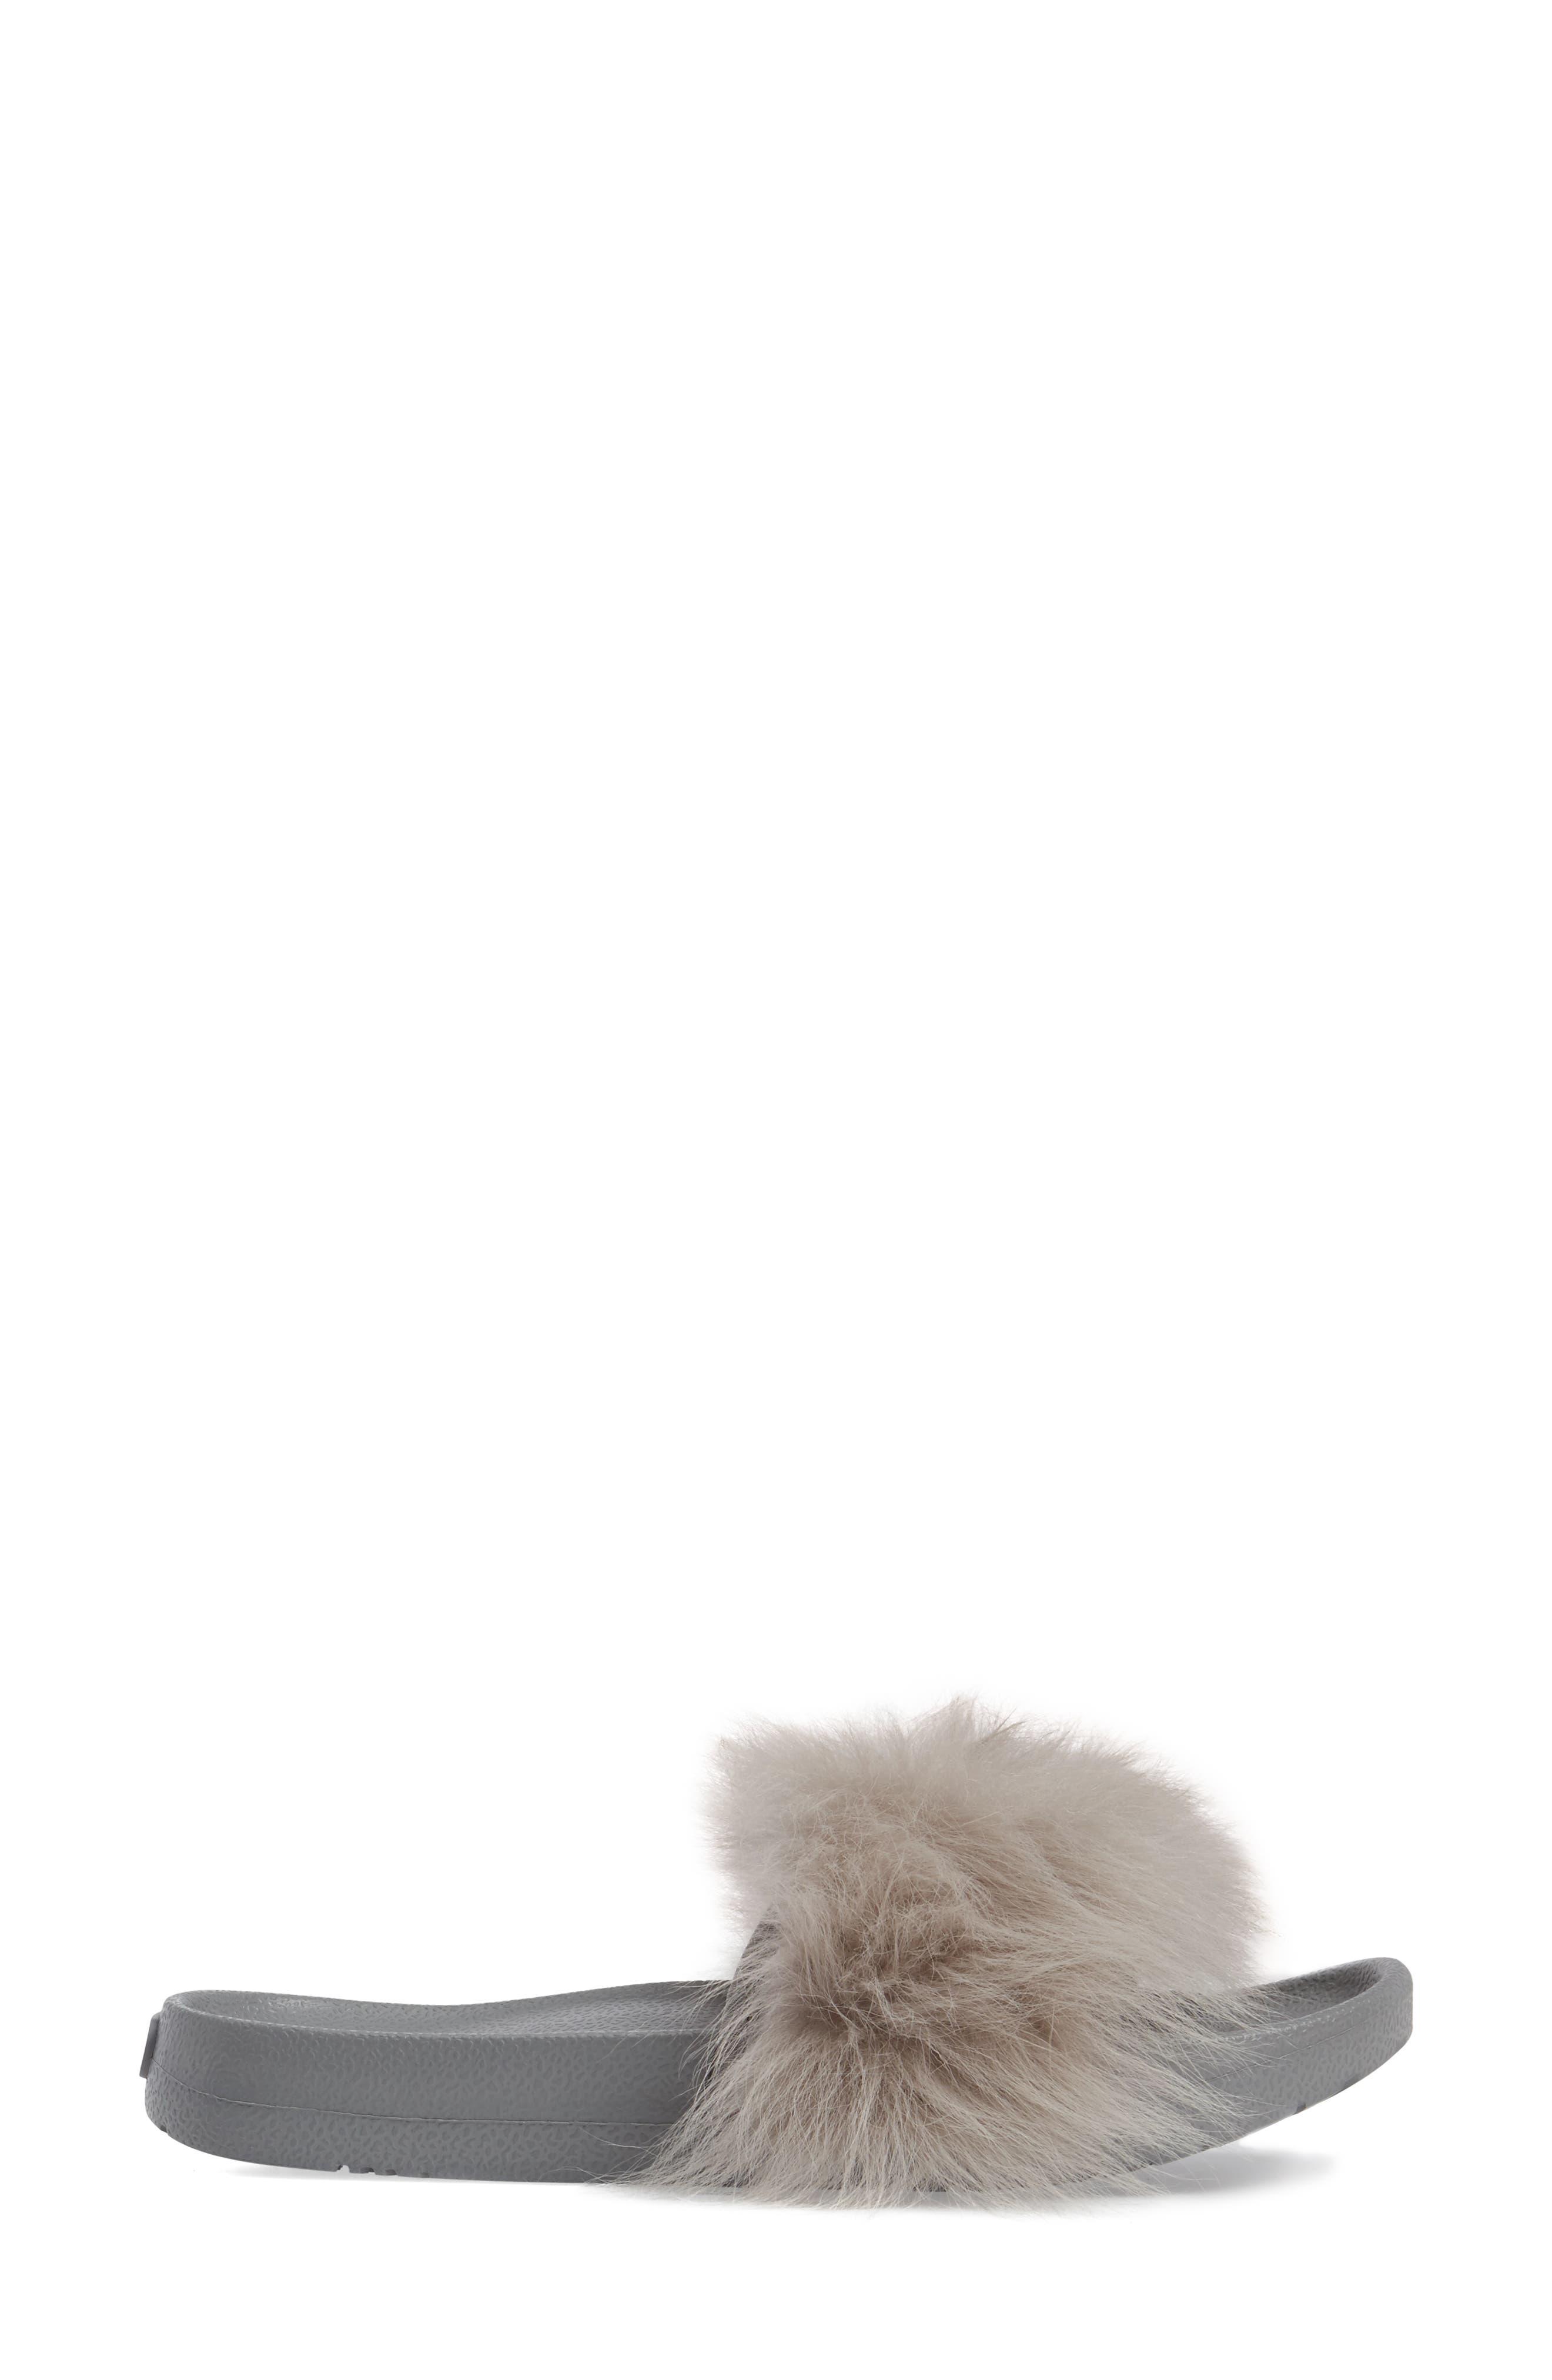 Royale Genuine Shearling Slide Sandal,                             Alternate thumbnail 3, color,                             Seal